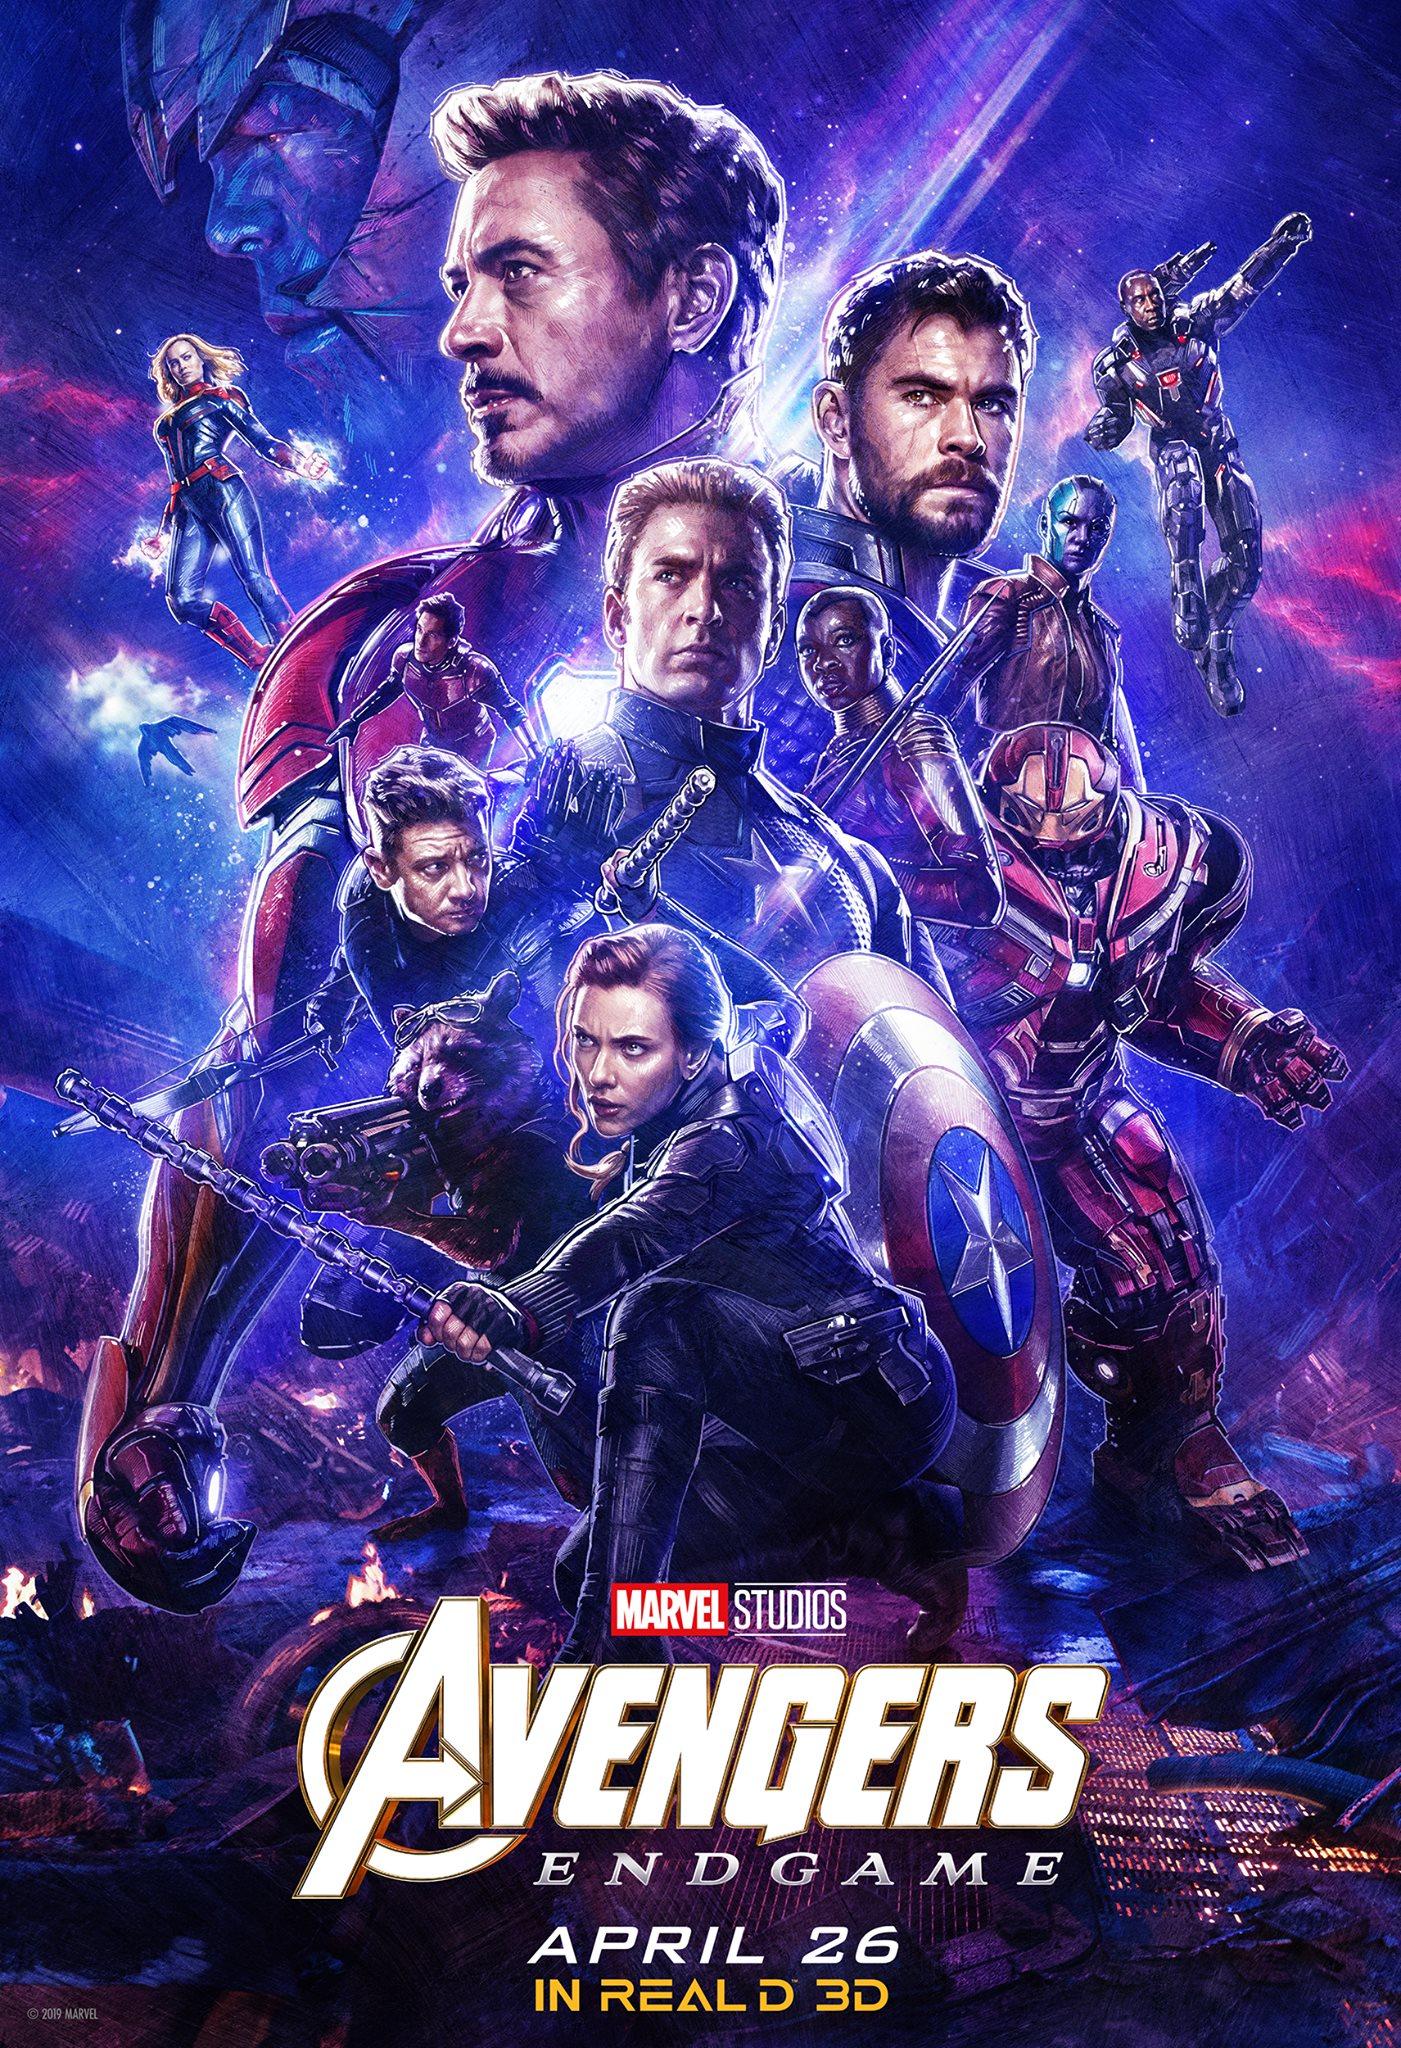 avengers_endgame_p46.png